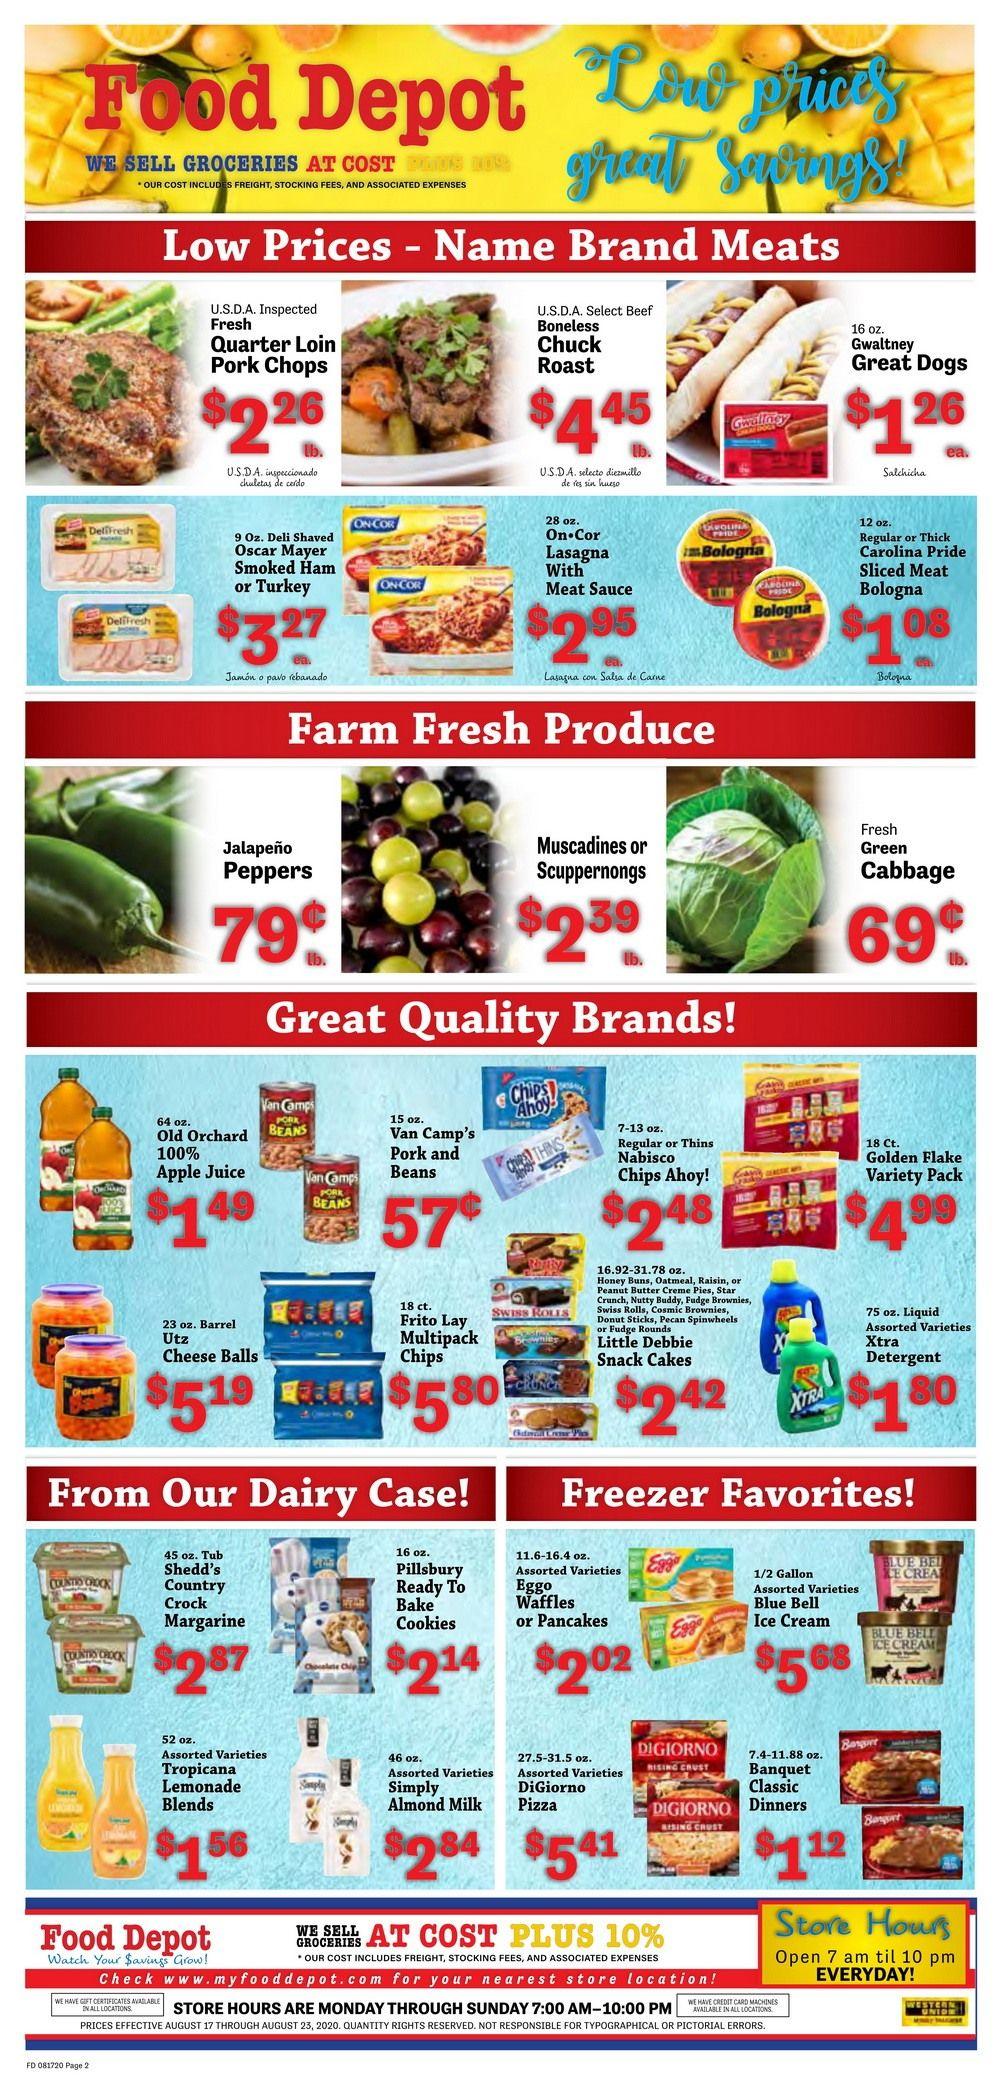 Food Depot Weekly Ad Aug 17 - Aug 23, 2020